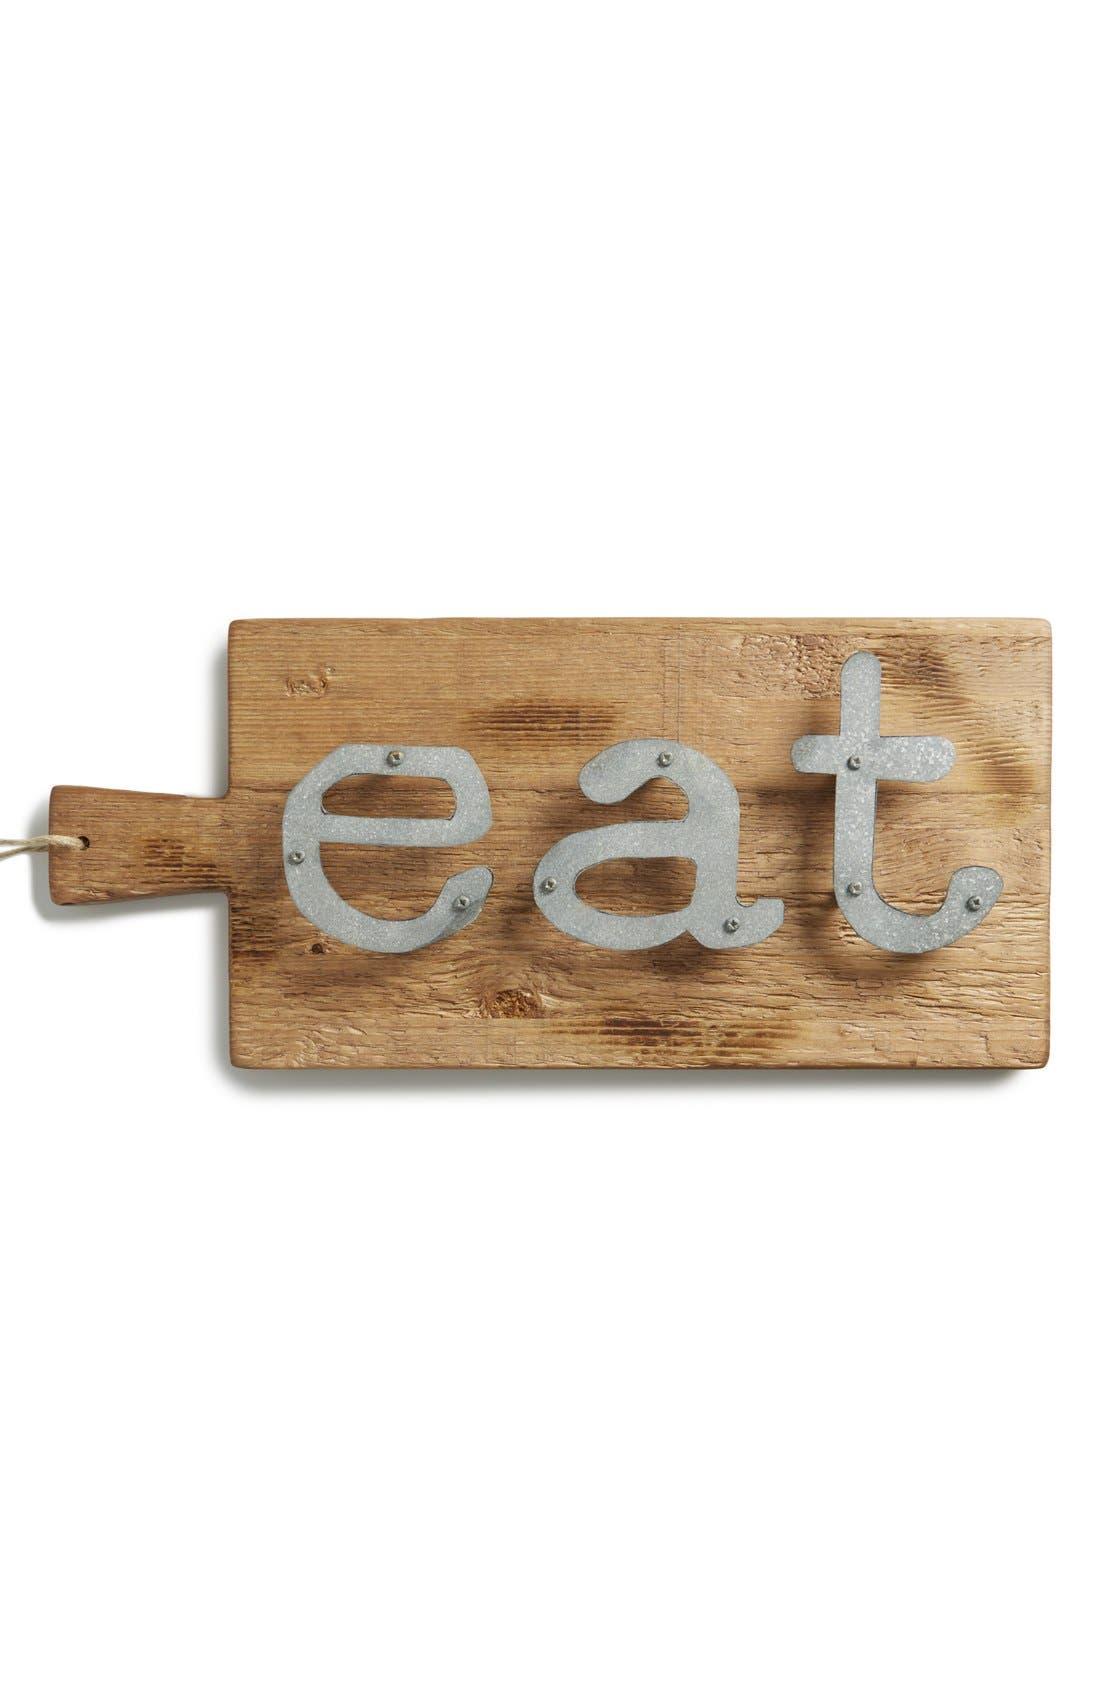 Alternate Image 1 Selected - Europe2You 'Eat' Reclaimed Wood Wall Art